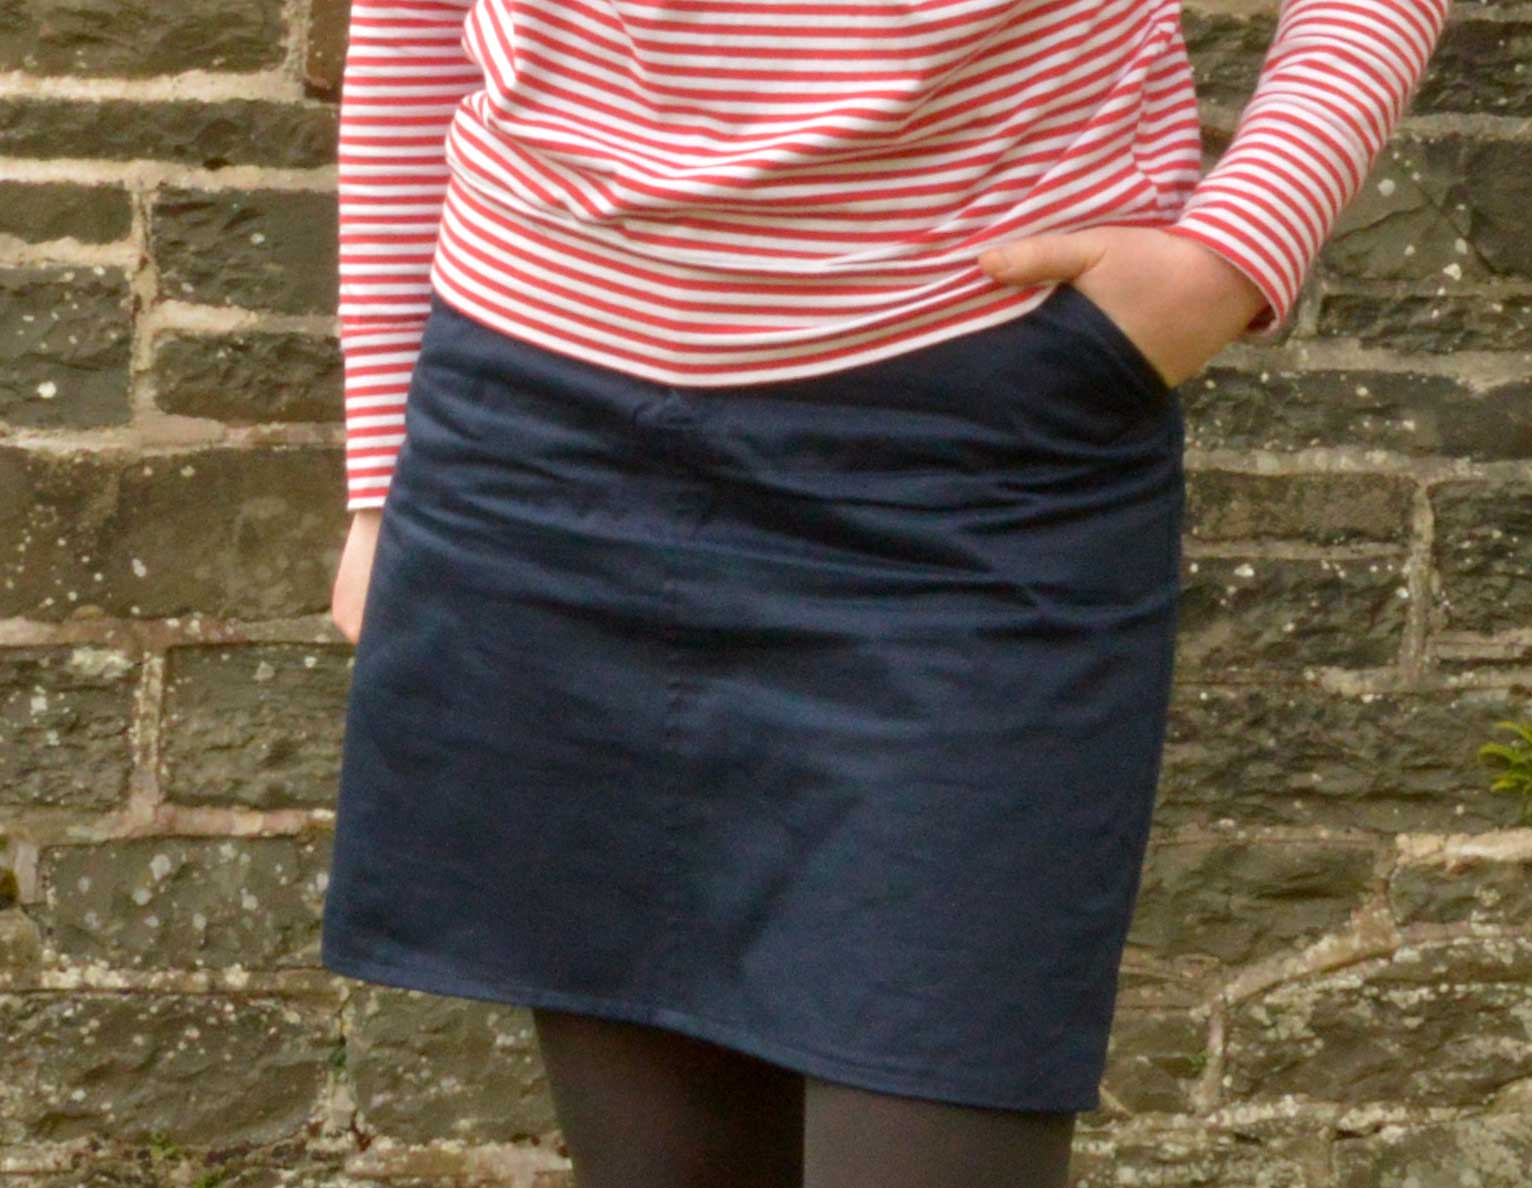 Holm Sown: Grainline Studio Moss Skirt - navy cotton twill